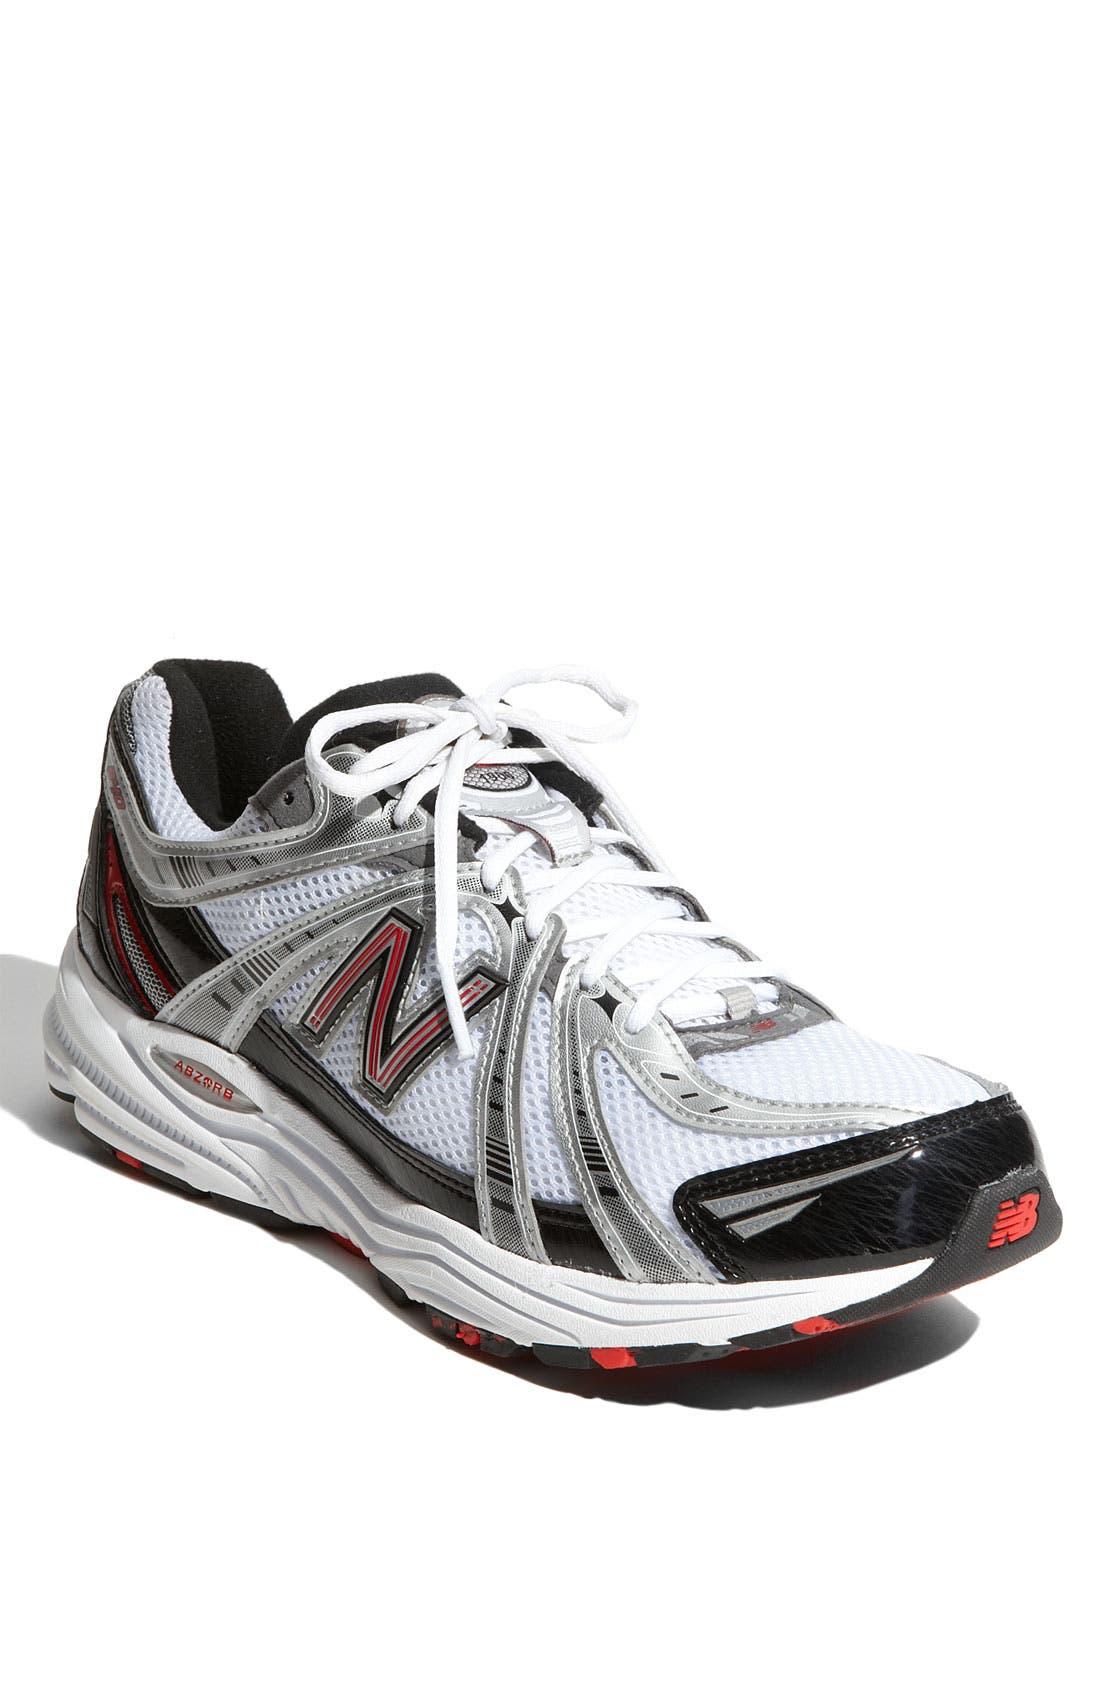 Main Image - New Balance '840' Running Shoe (Men) (Online Only)